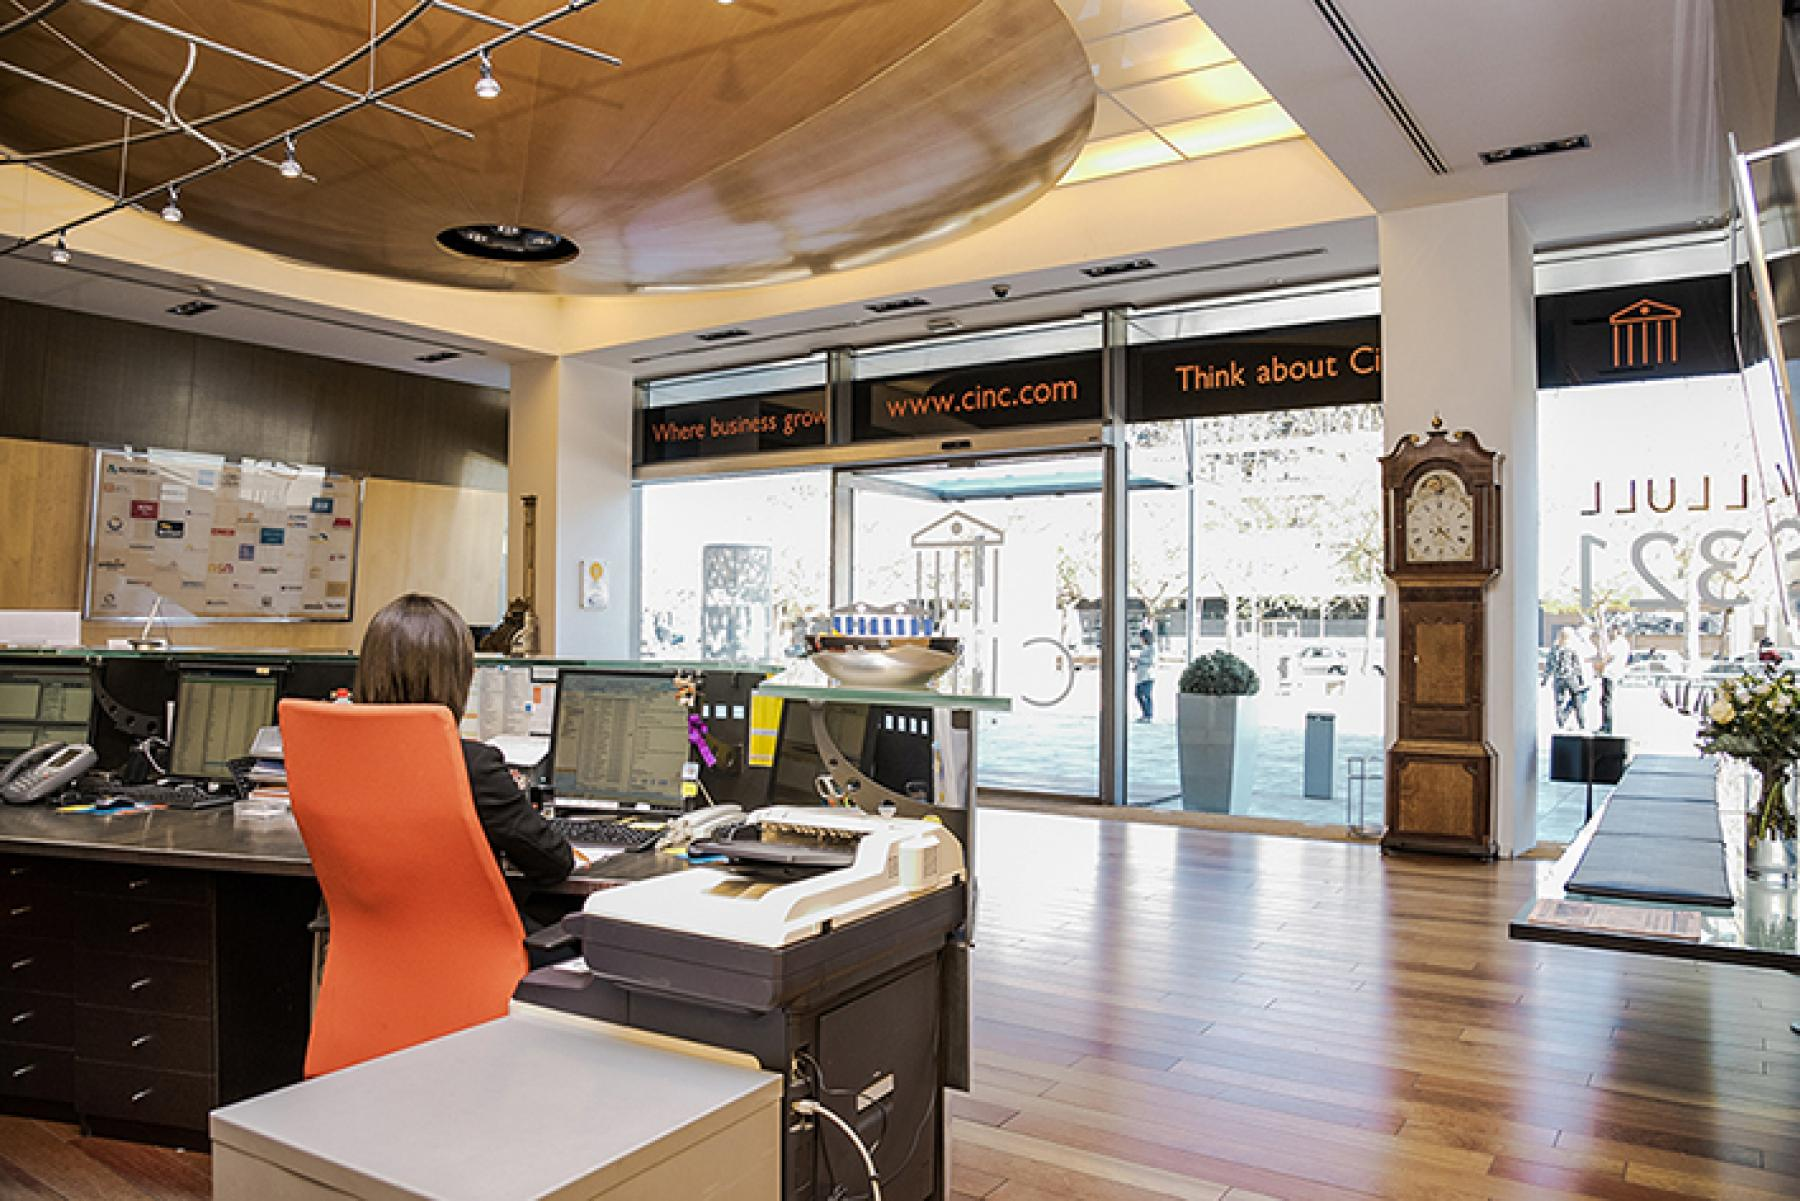 Reception area in Carrer de Llull